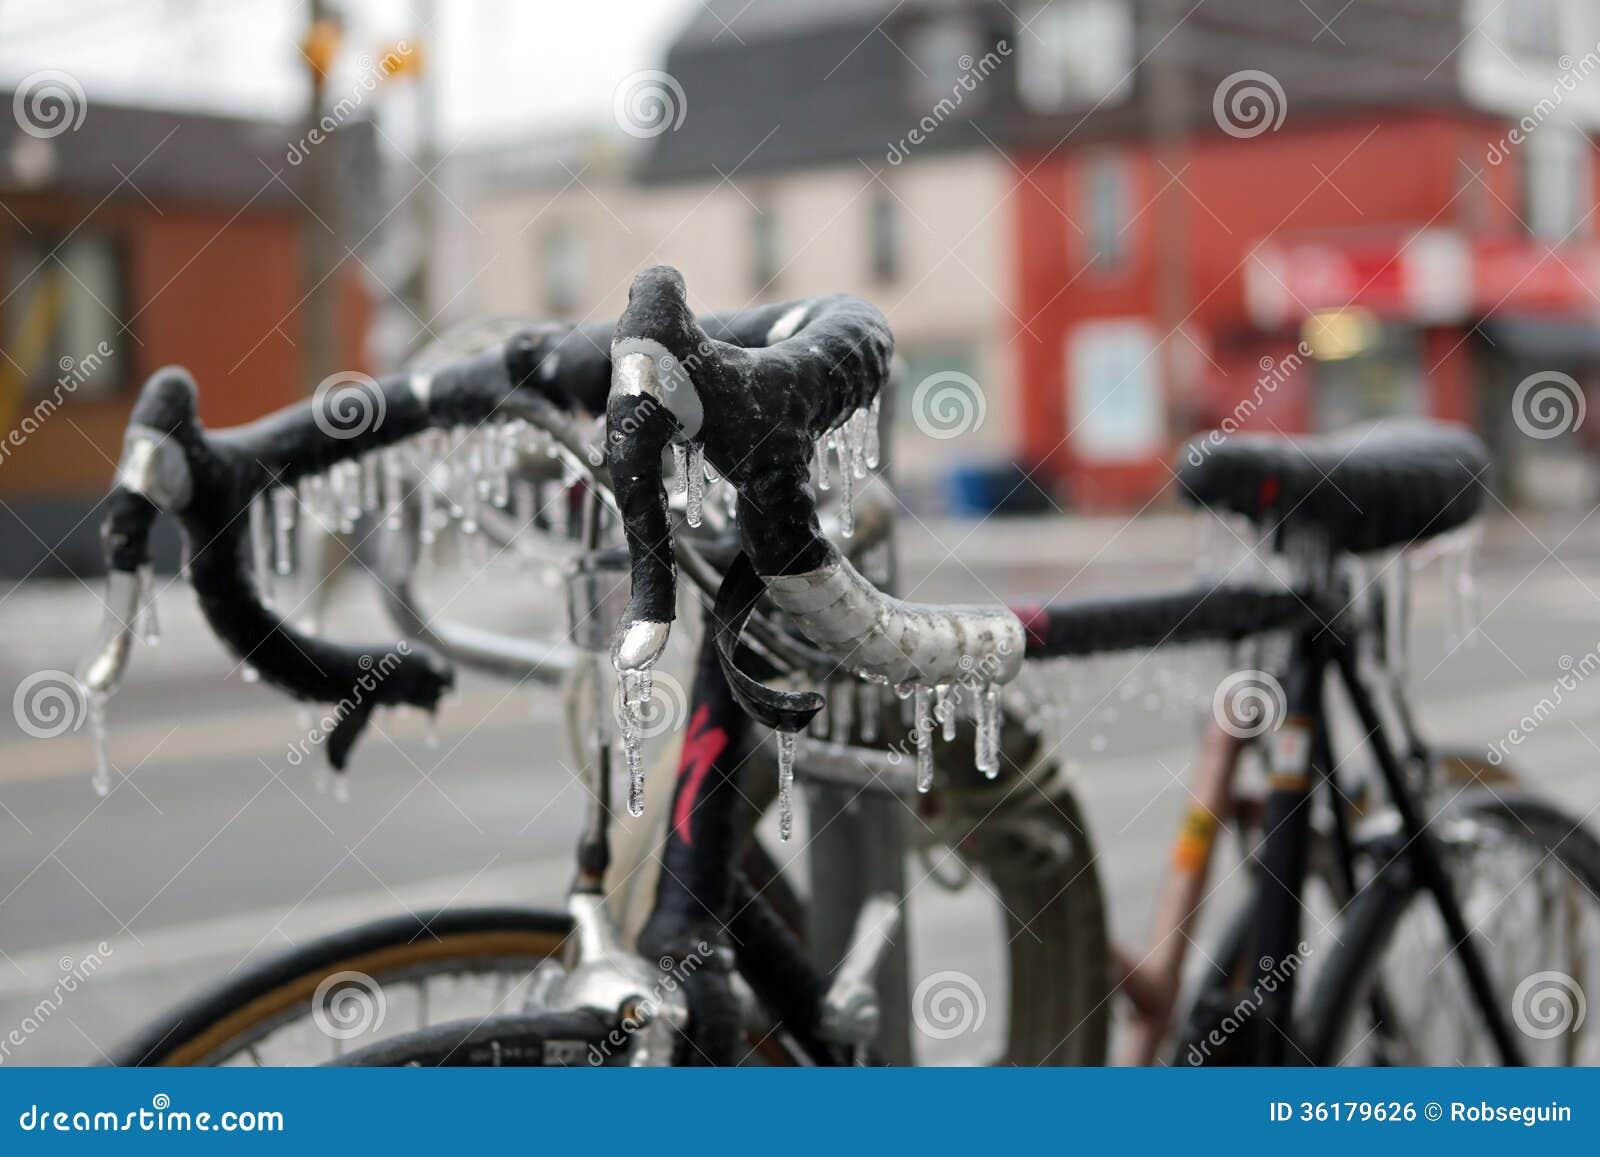 Frozen bicycle stock photo. Image of storm, toronto ...